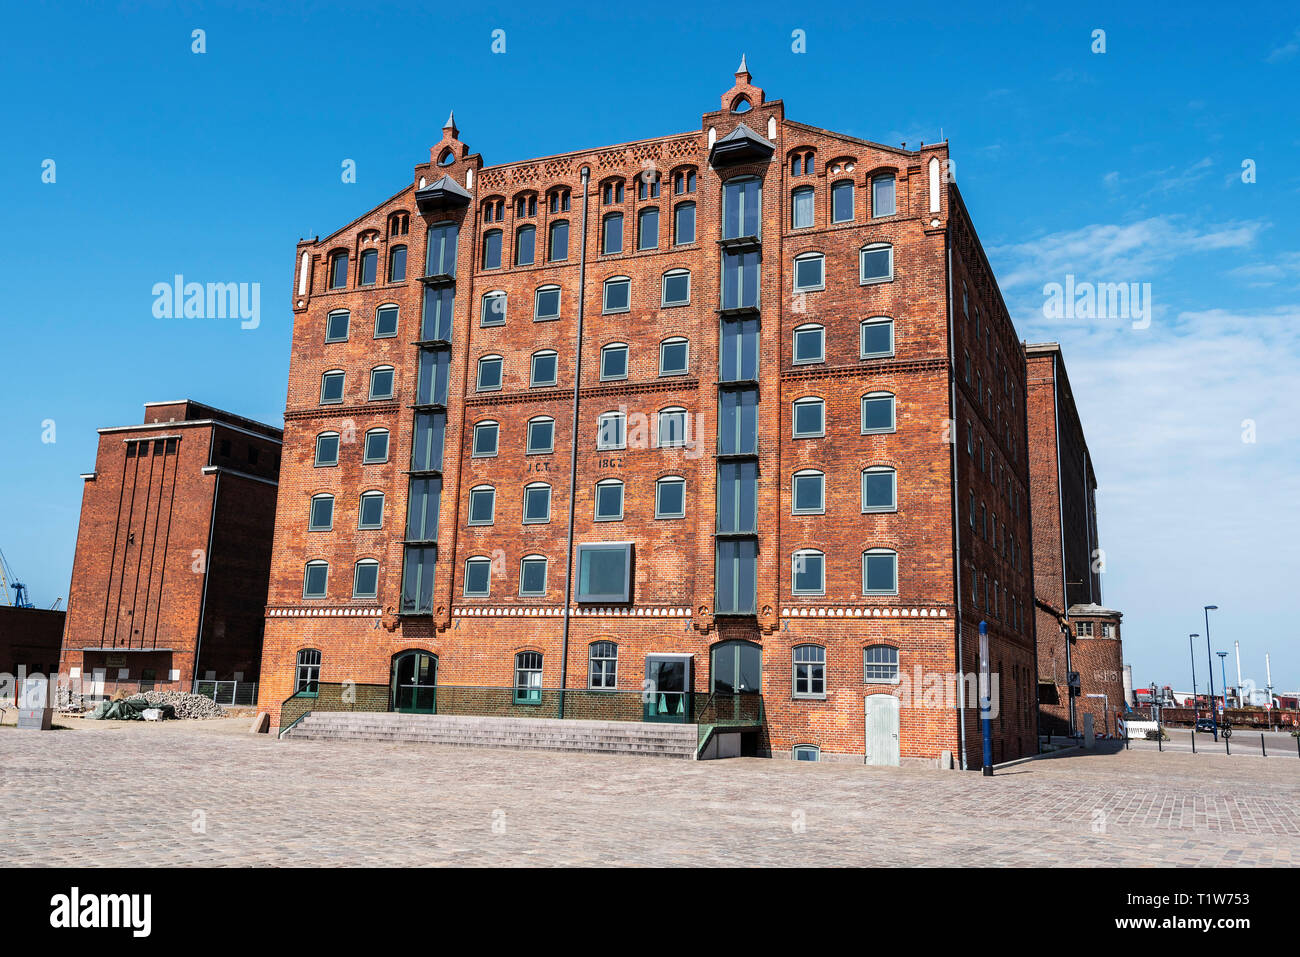 storage buildings, old port, Wismar, Mecklenburg-Western Pomerania, Germany - Stock Image